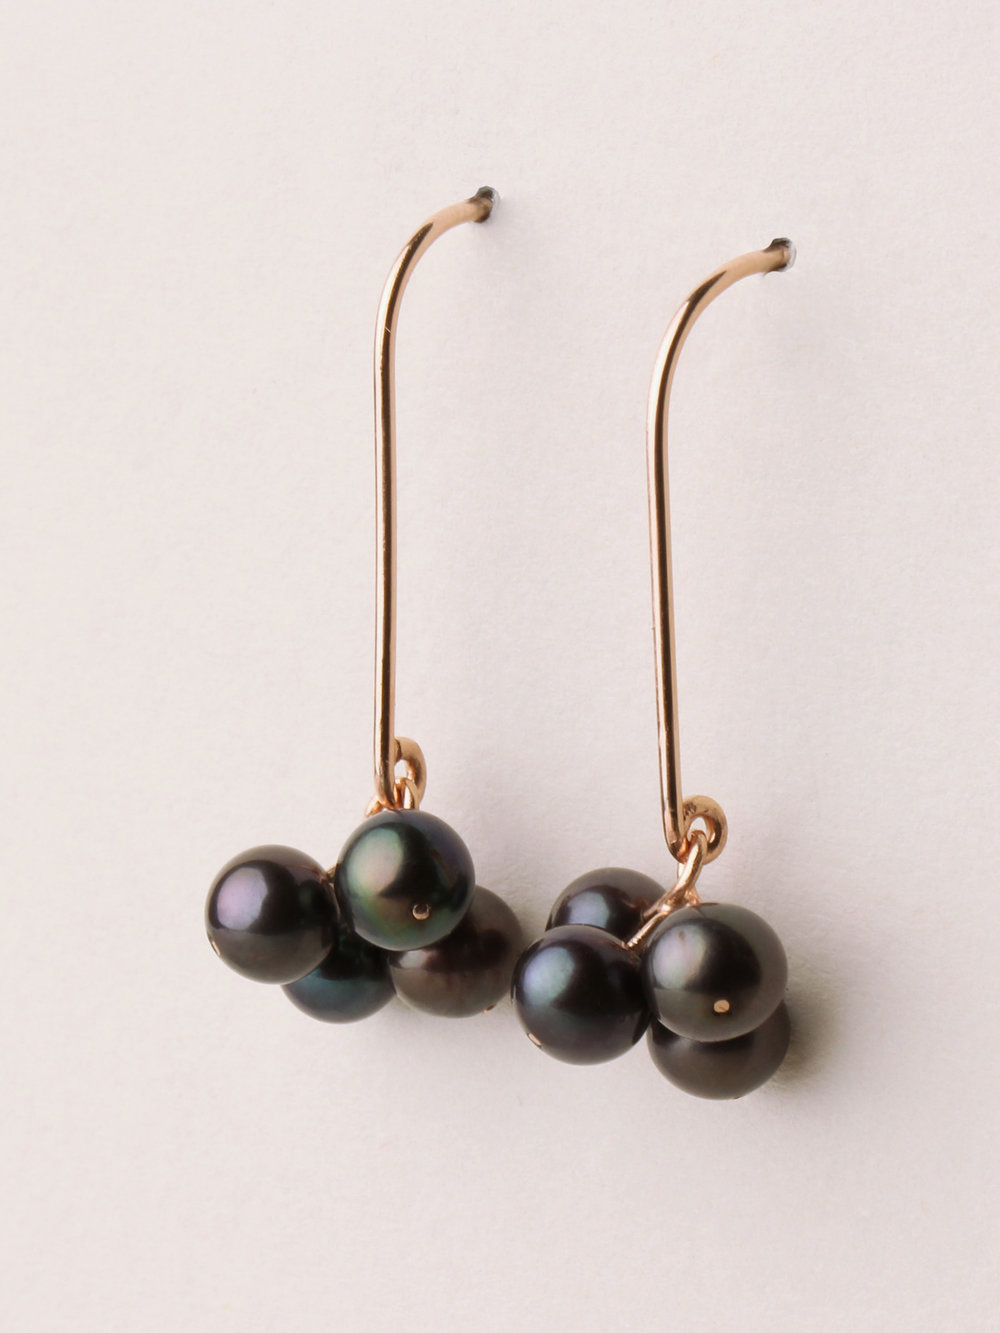 Perlen Ohrhänger mit 4 Perlen, lang in 585 Rosegold und echten Süßwasserzuchtperlen  Pearl earrings with 4 pearls, long in 14kt Rosegold and sweetwater pearls